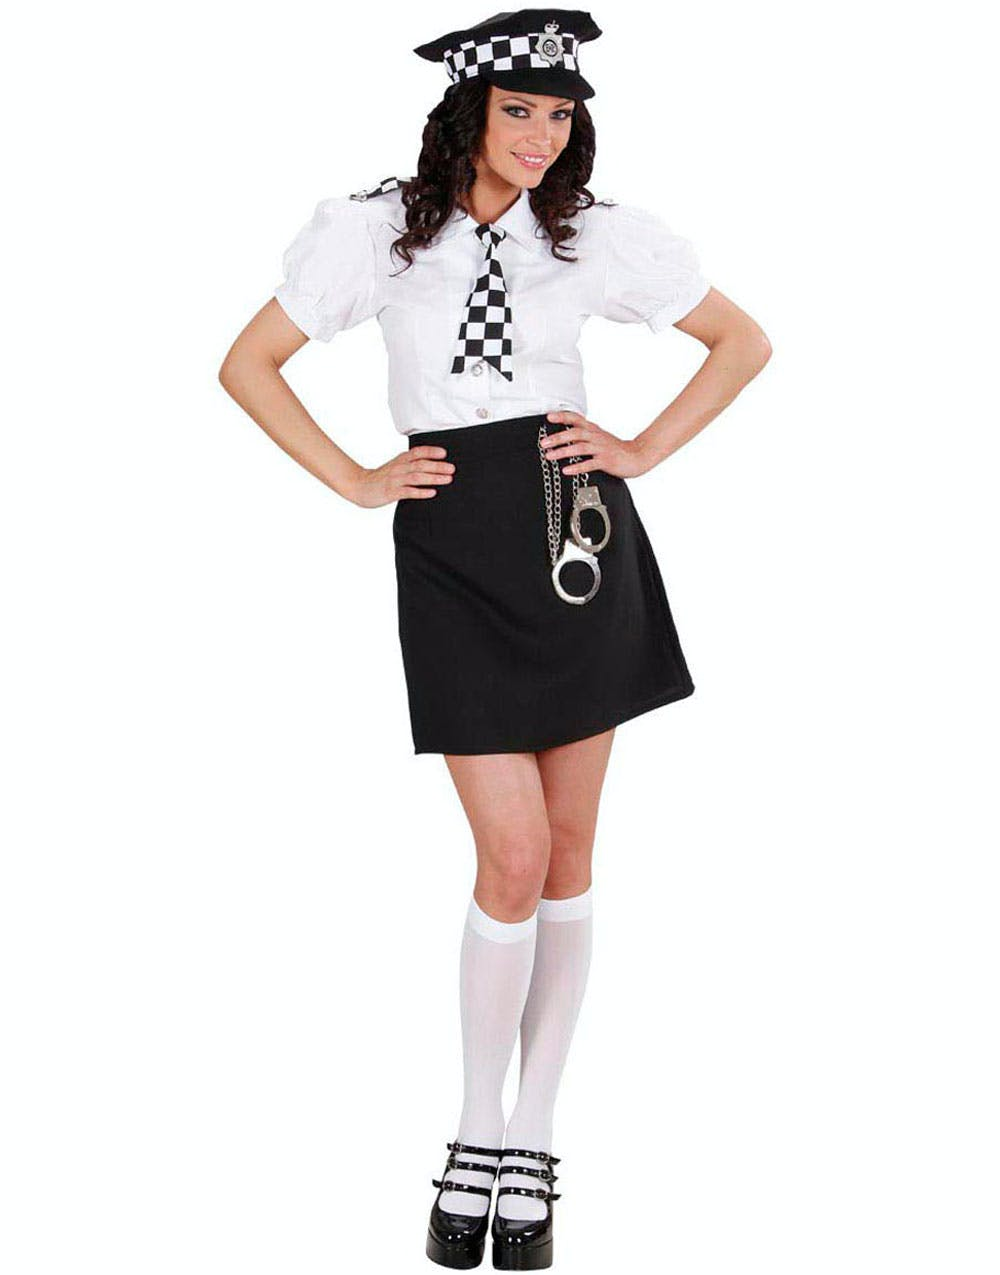 eskorte molde politi kostyme dame